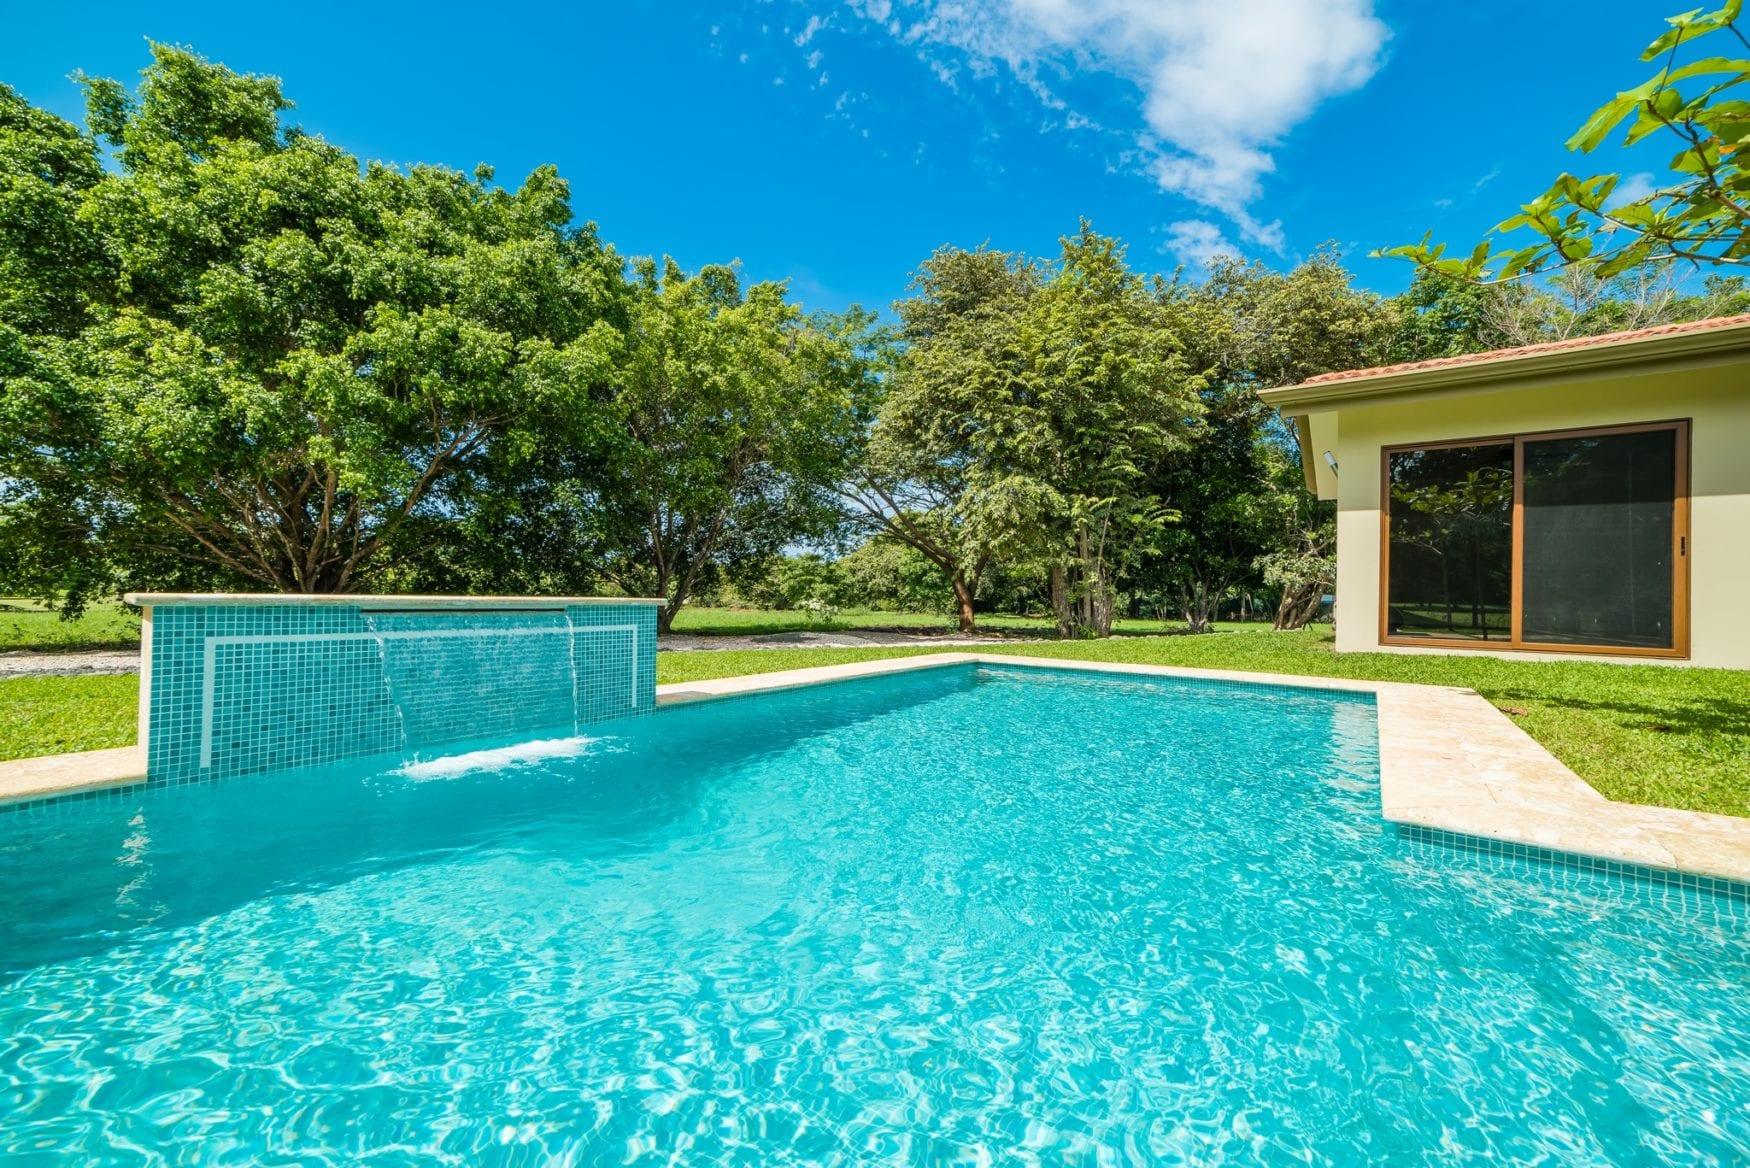 Swimming pool & garden 4